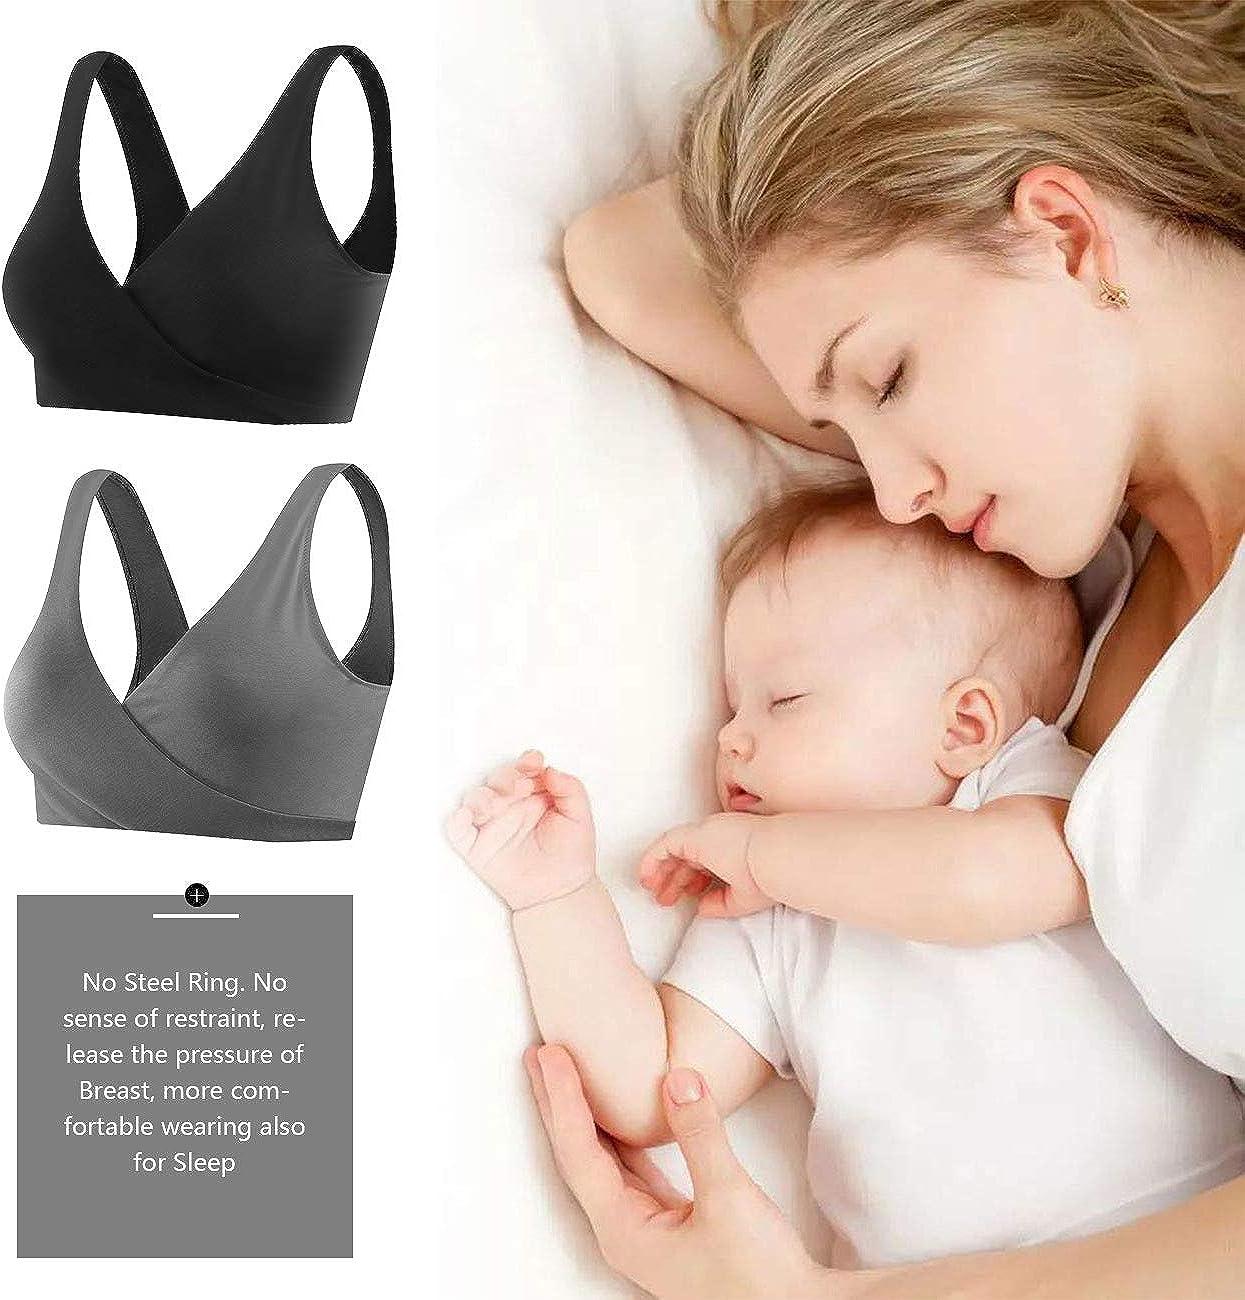 Sunzel Womens Cotton Spandex Seamless Sleep Bra for Nursing and Maternity